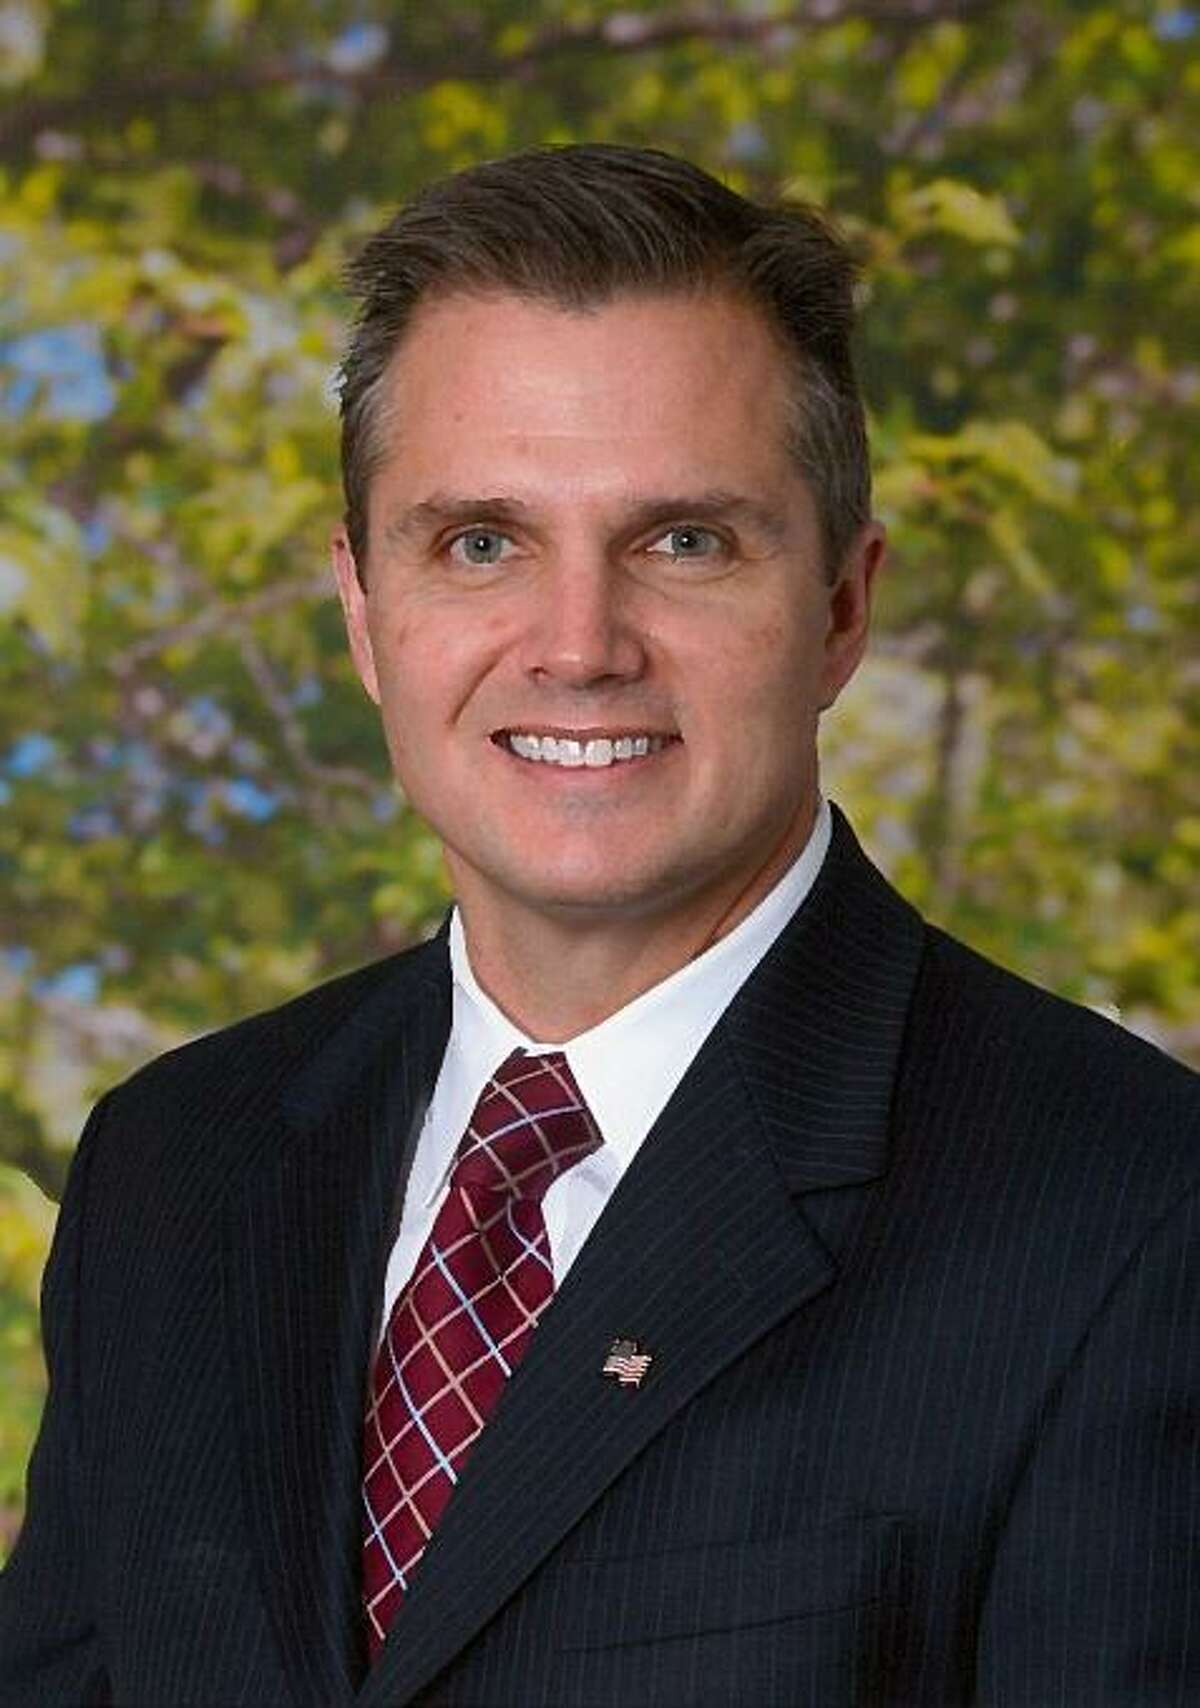 File photo of John Barile, Brookfield superintendent